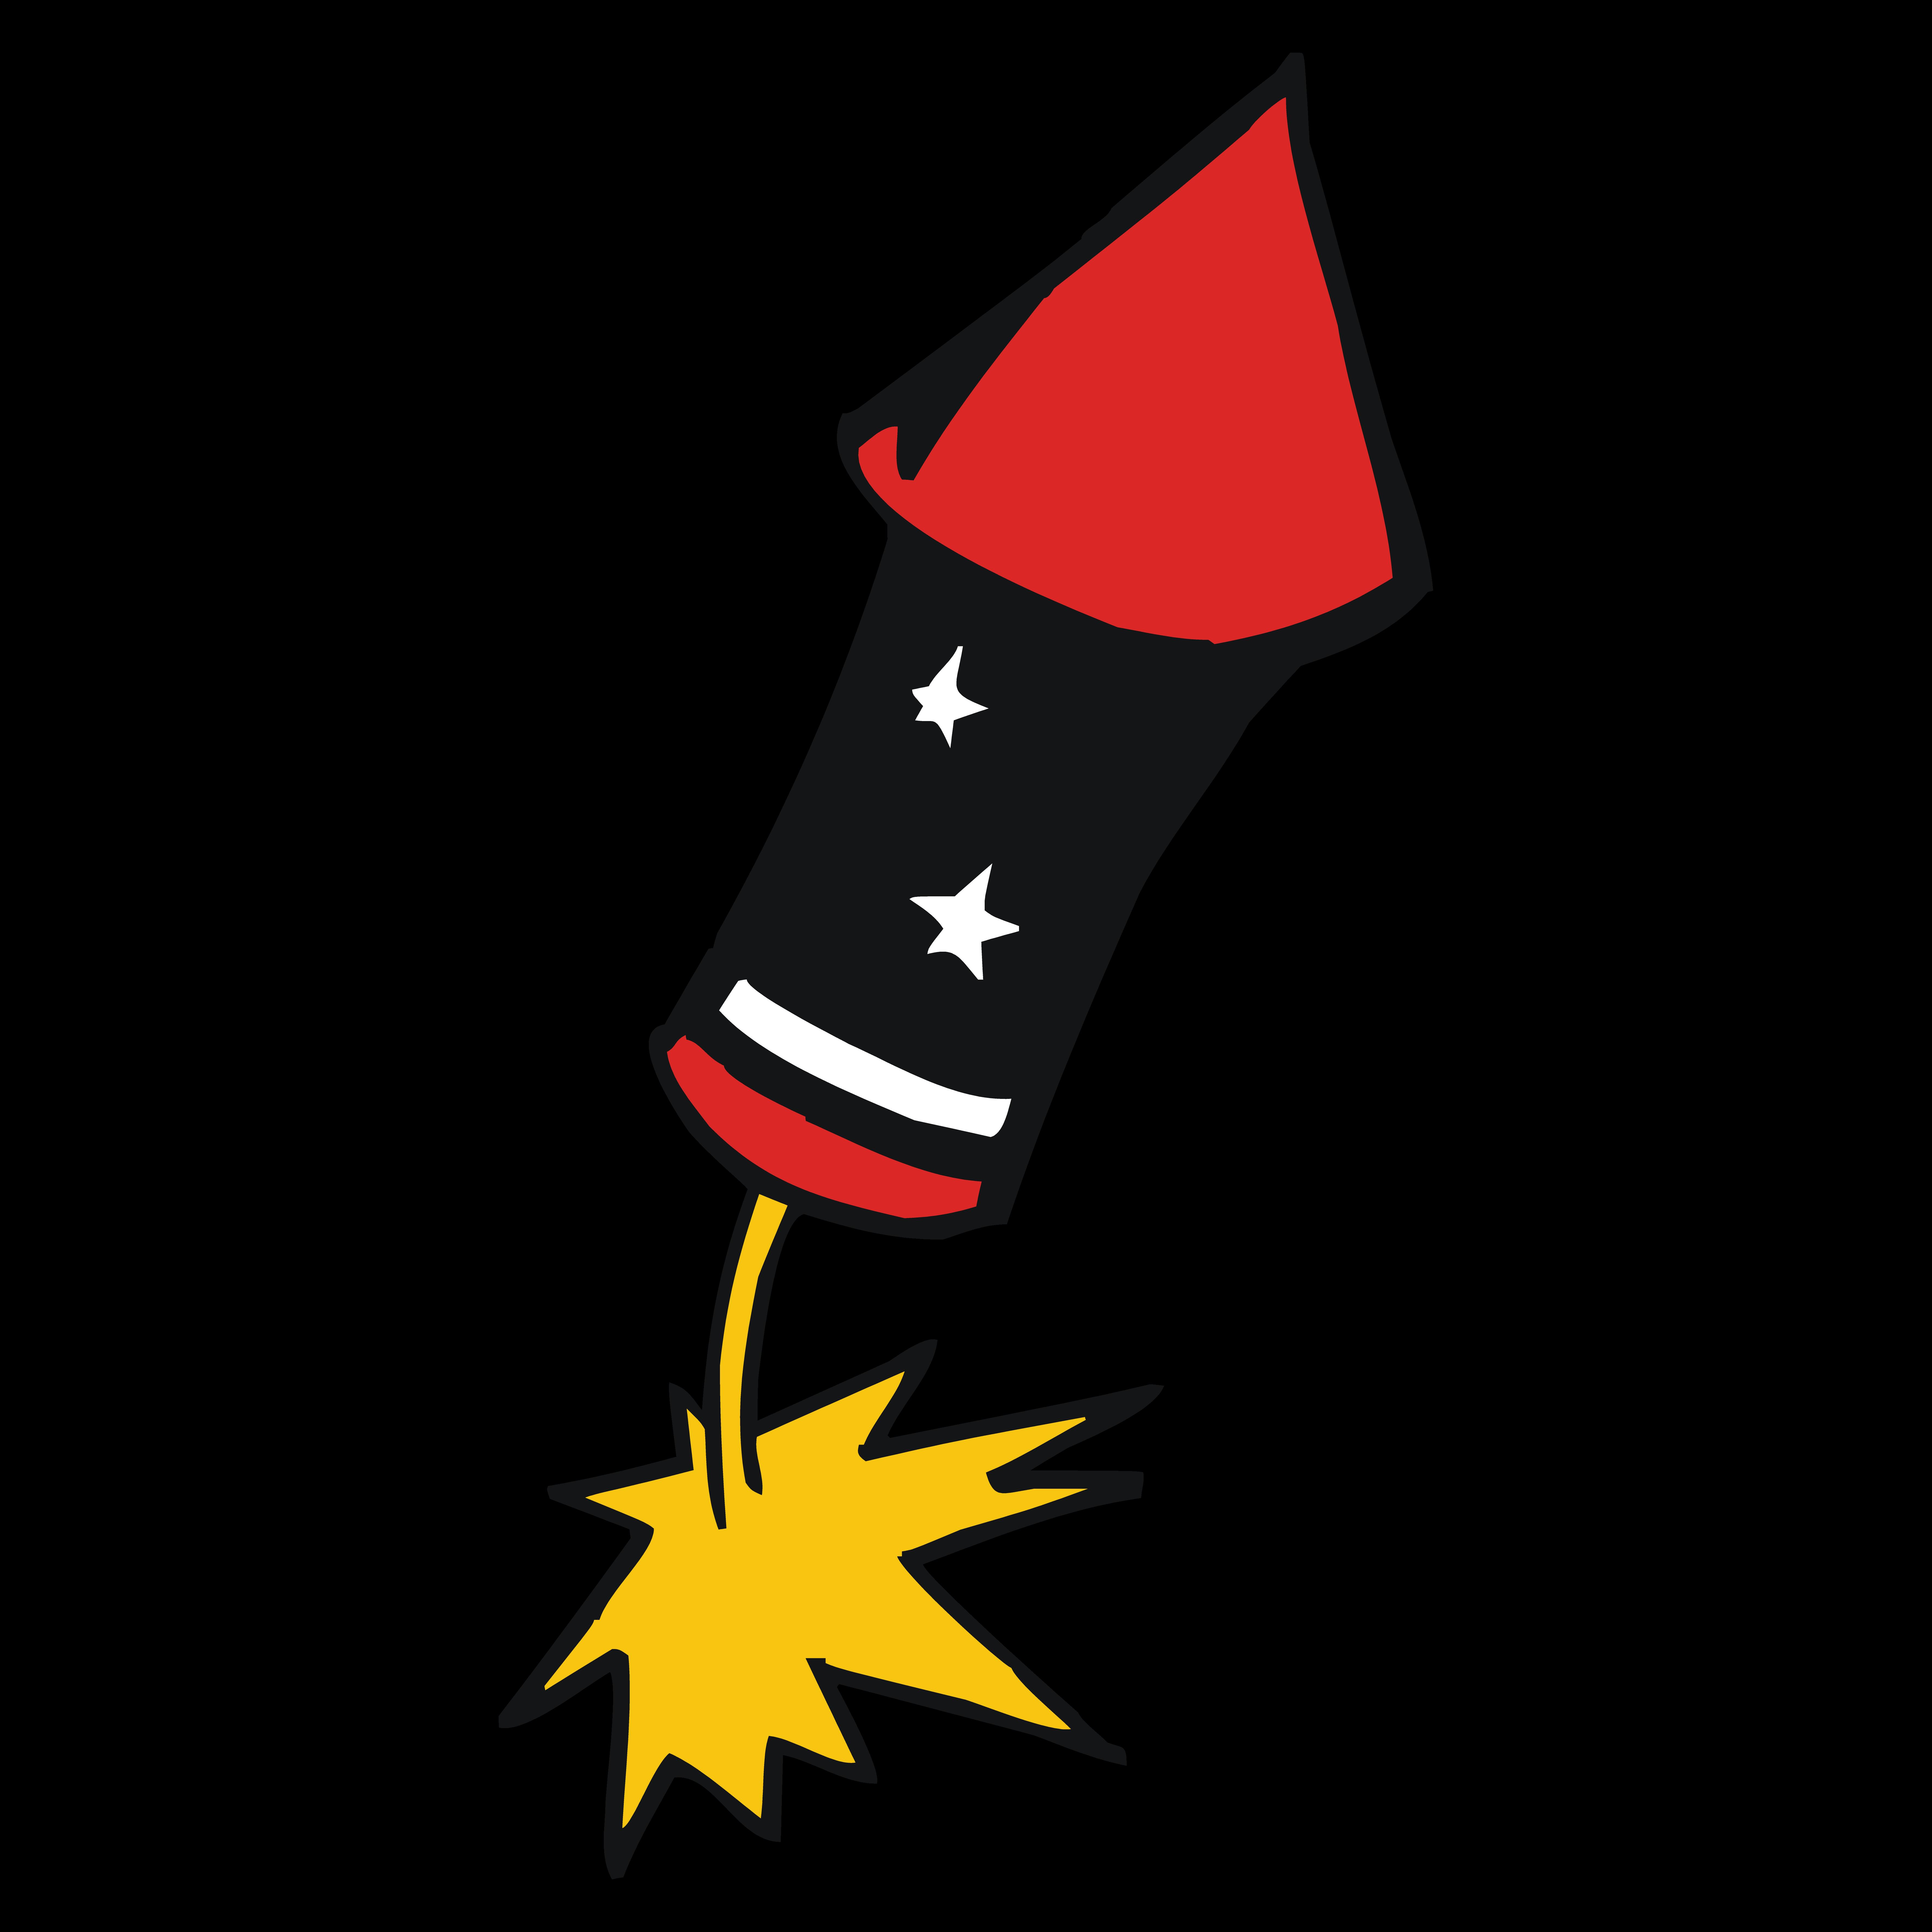 Rocket 2